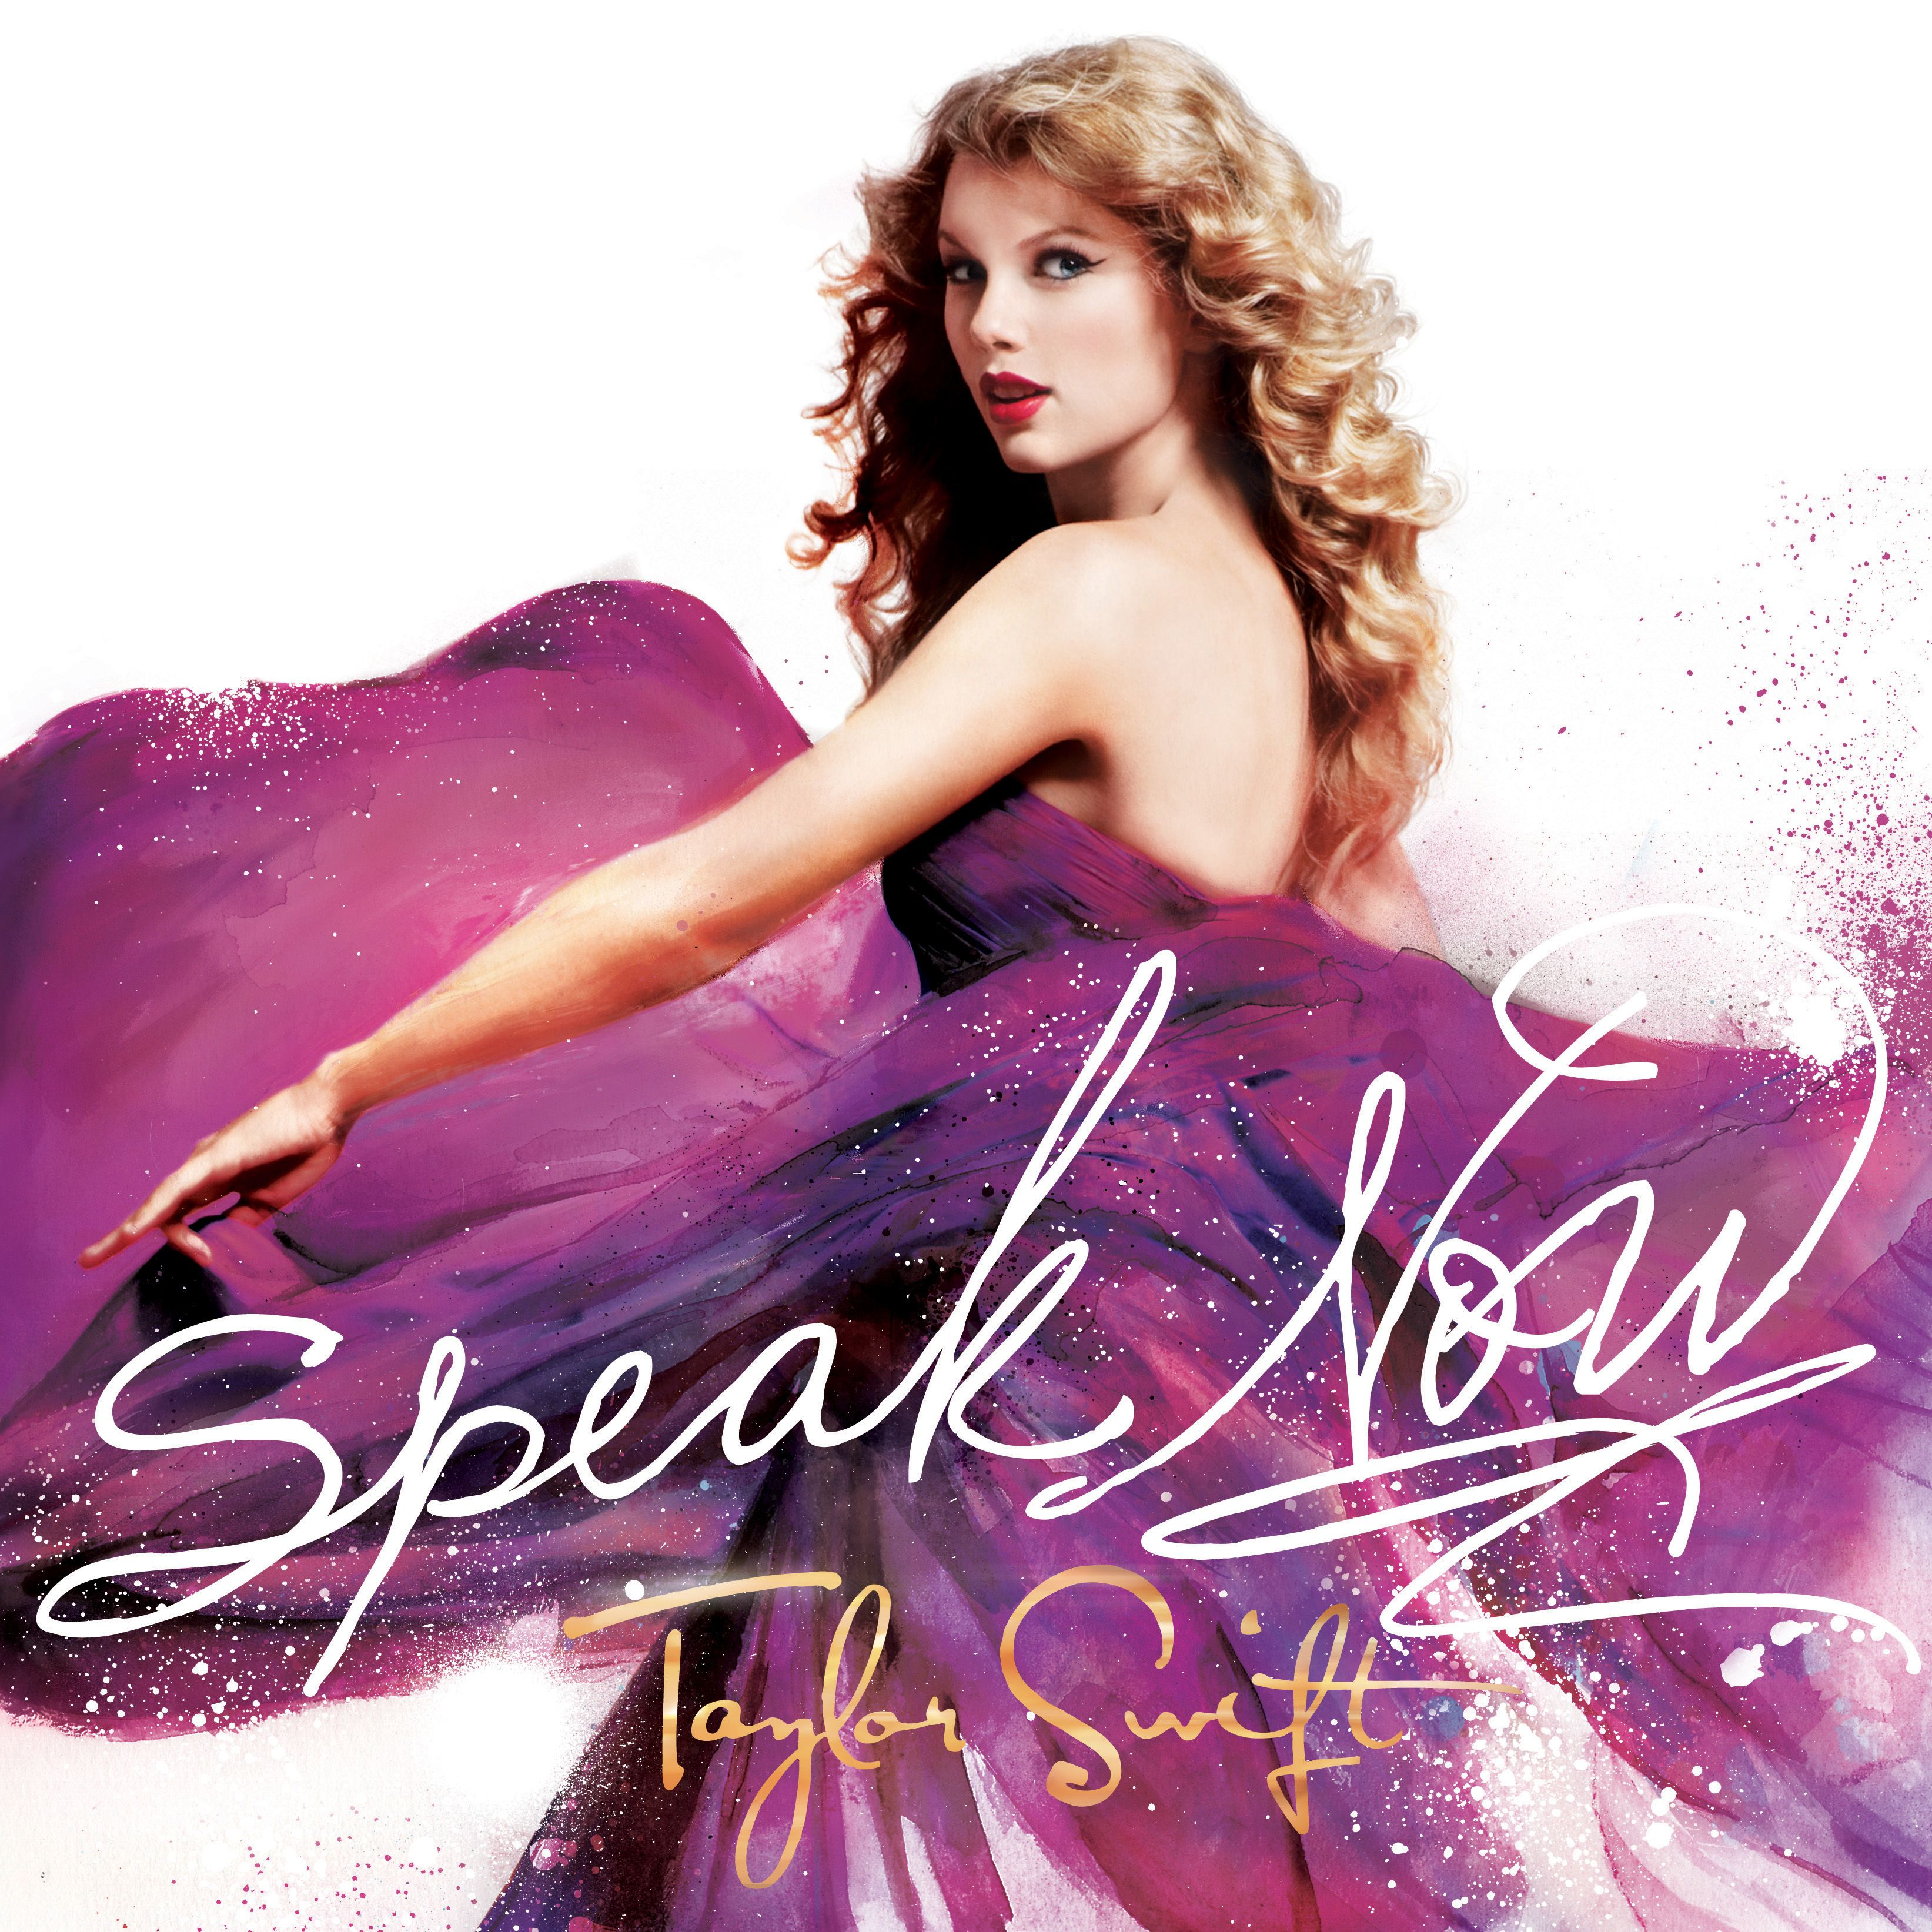 Taylor Swift - Speak Now Album.